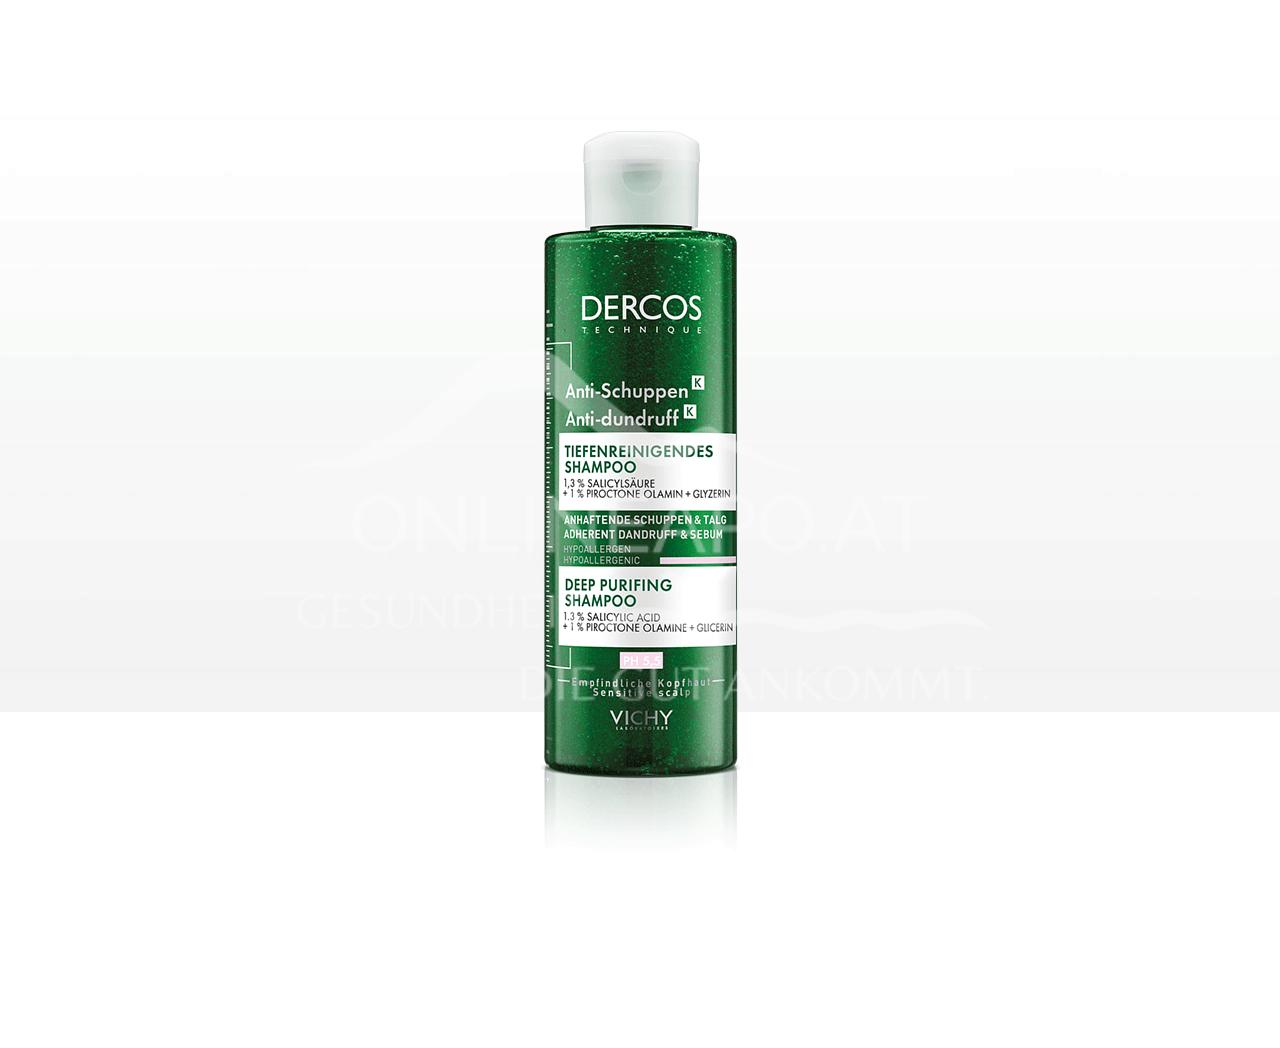 VICHY DERCOS Anti-Schuppen K Shampoo